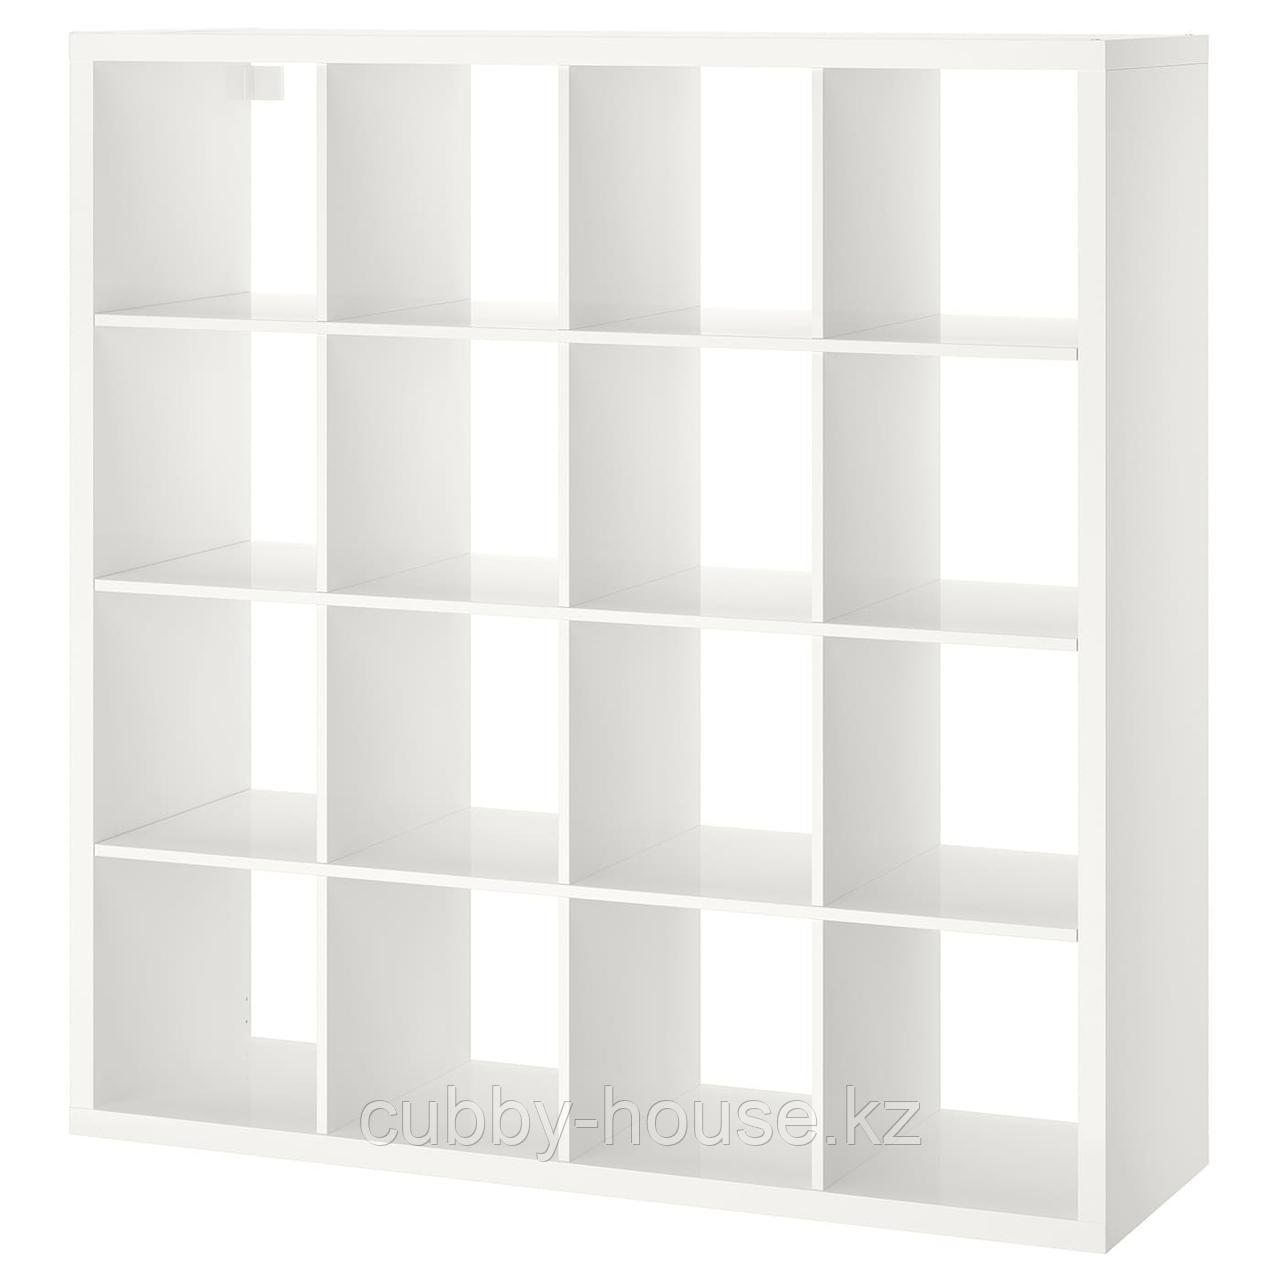 КАЛЛАКС Стеллаж, белый, 147x147 см